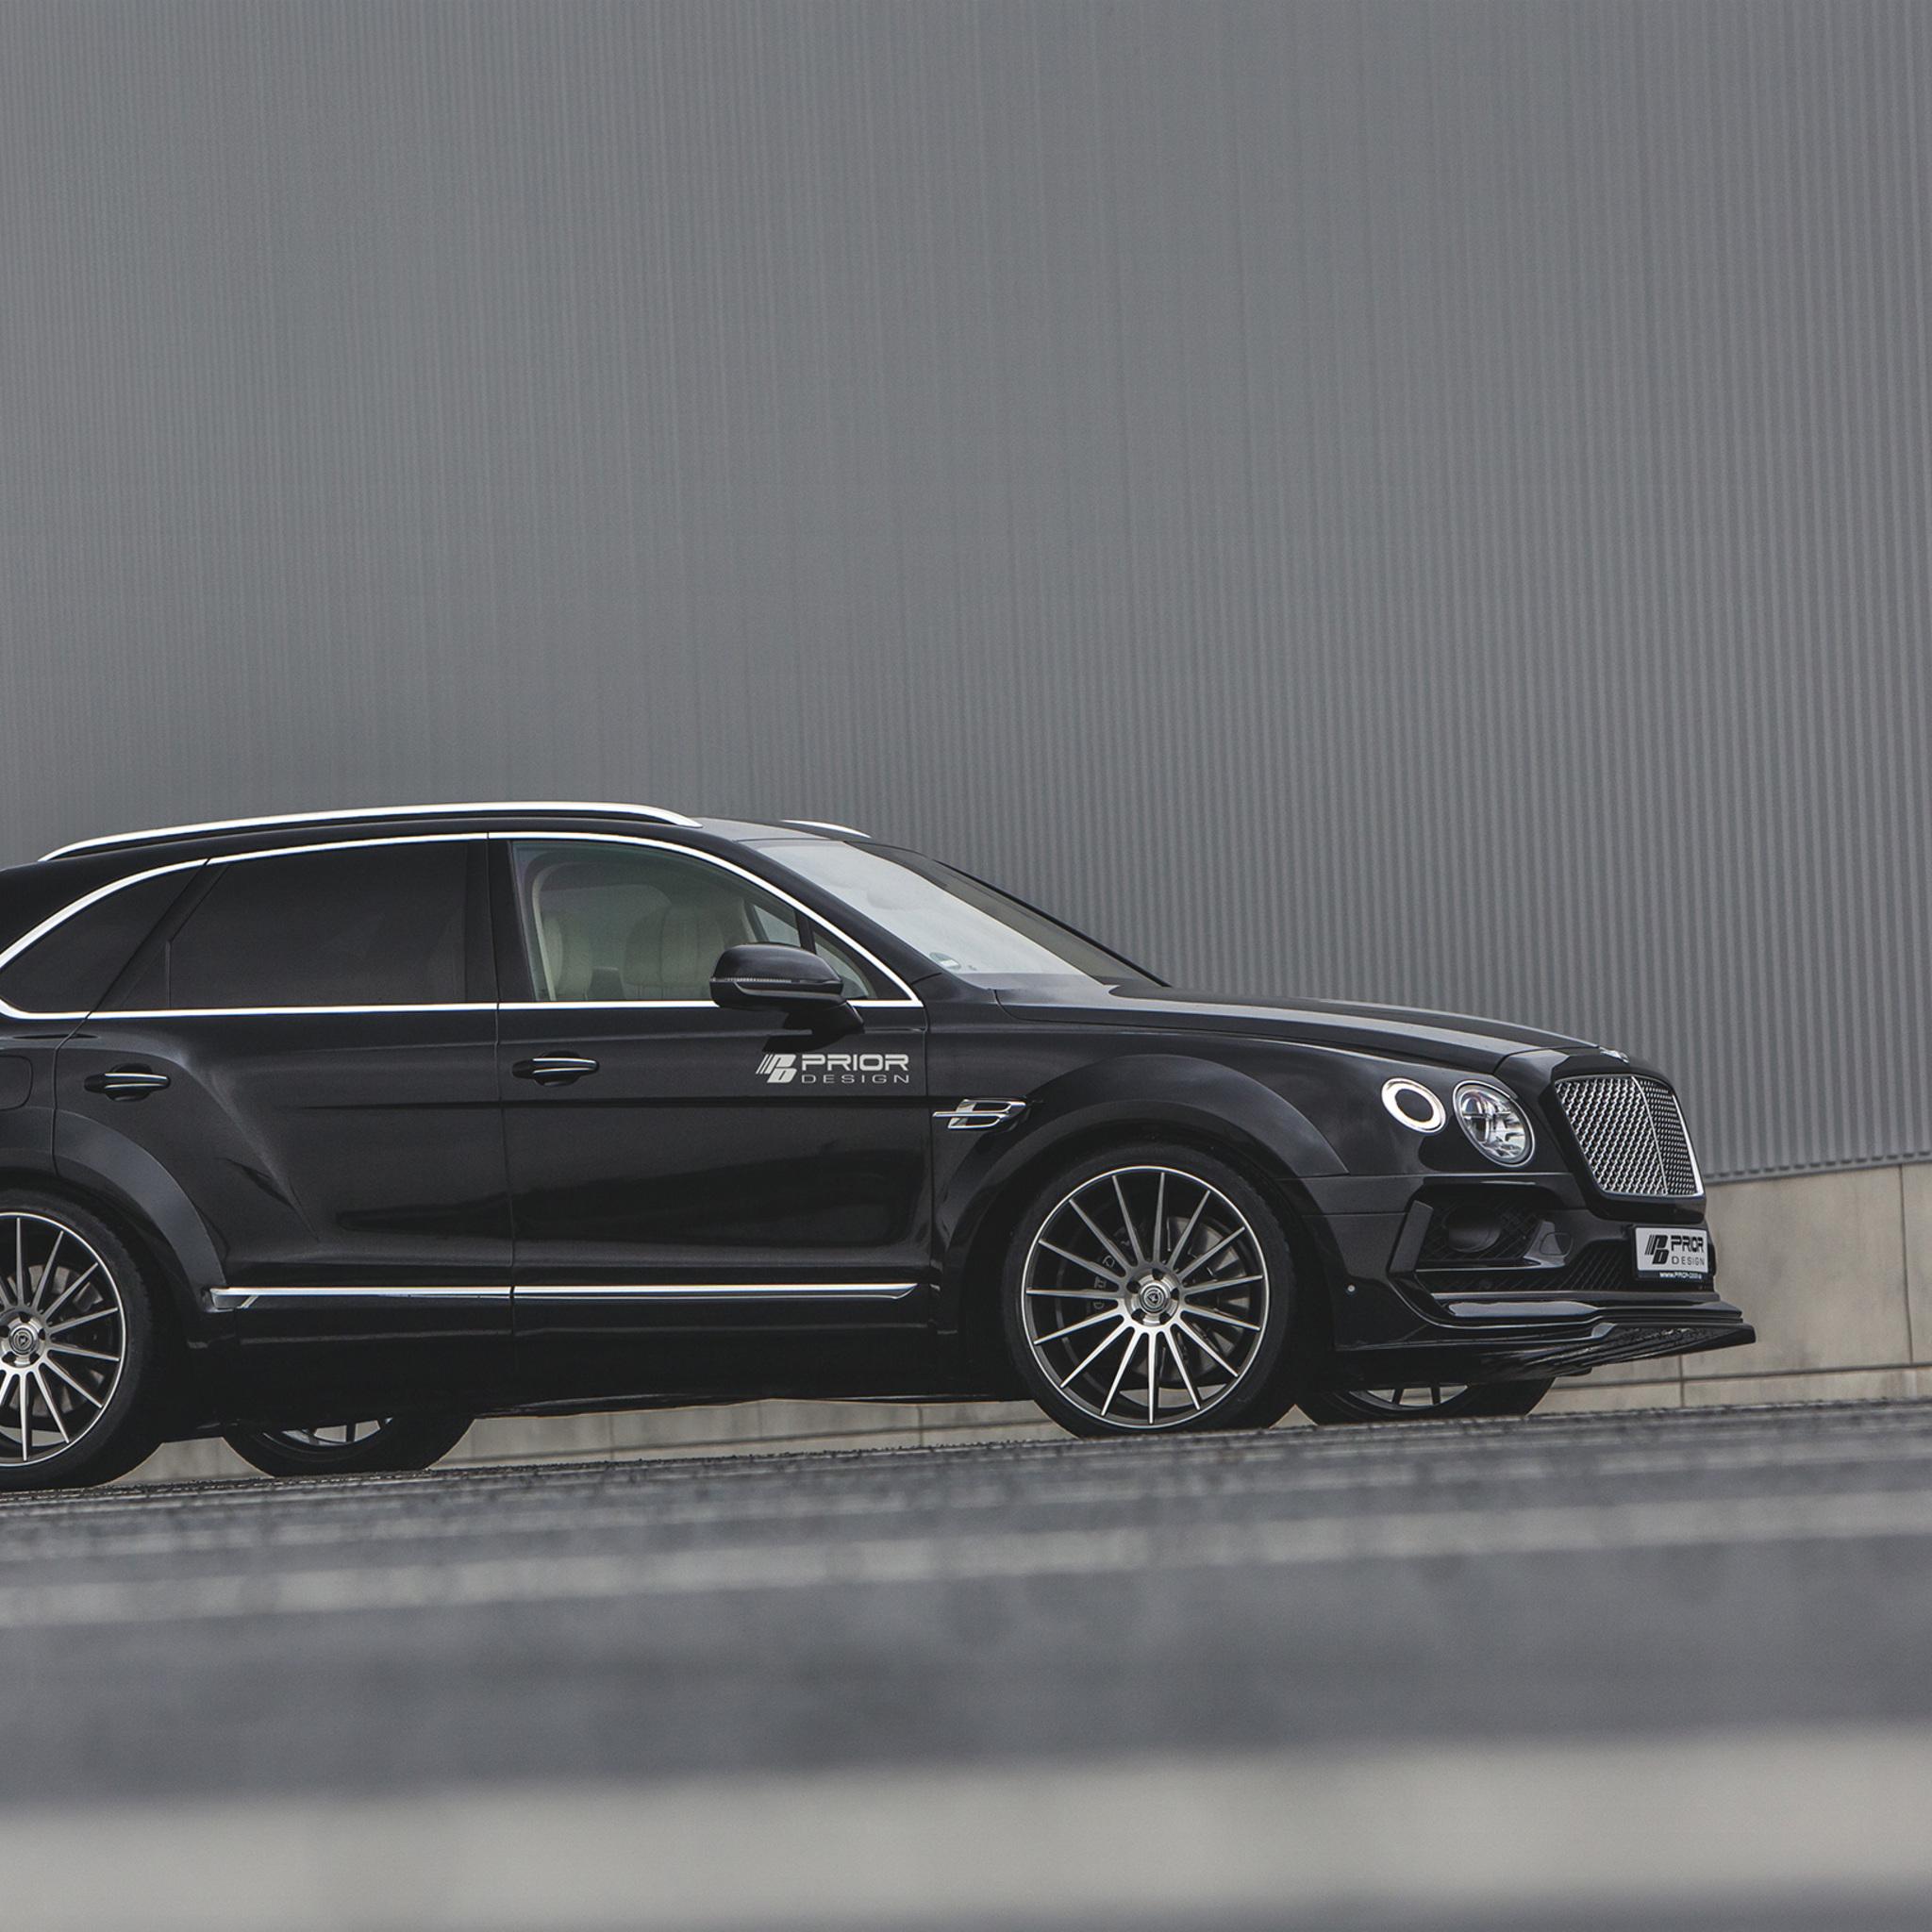 Bentley Car Wallpaper: 2048x2048 Prior Design Bentley Bentayga Side View Ipad Air